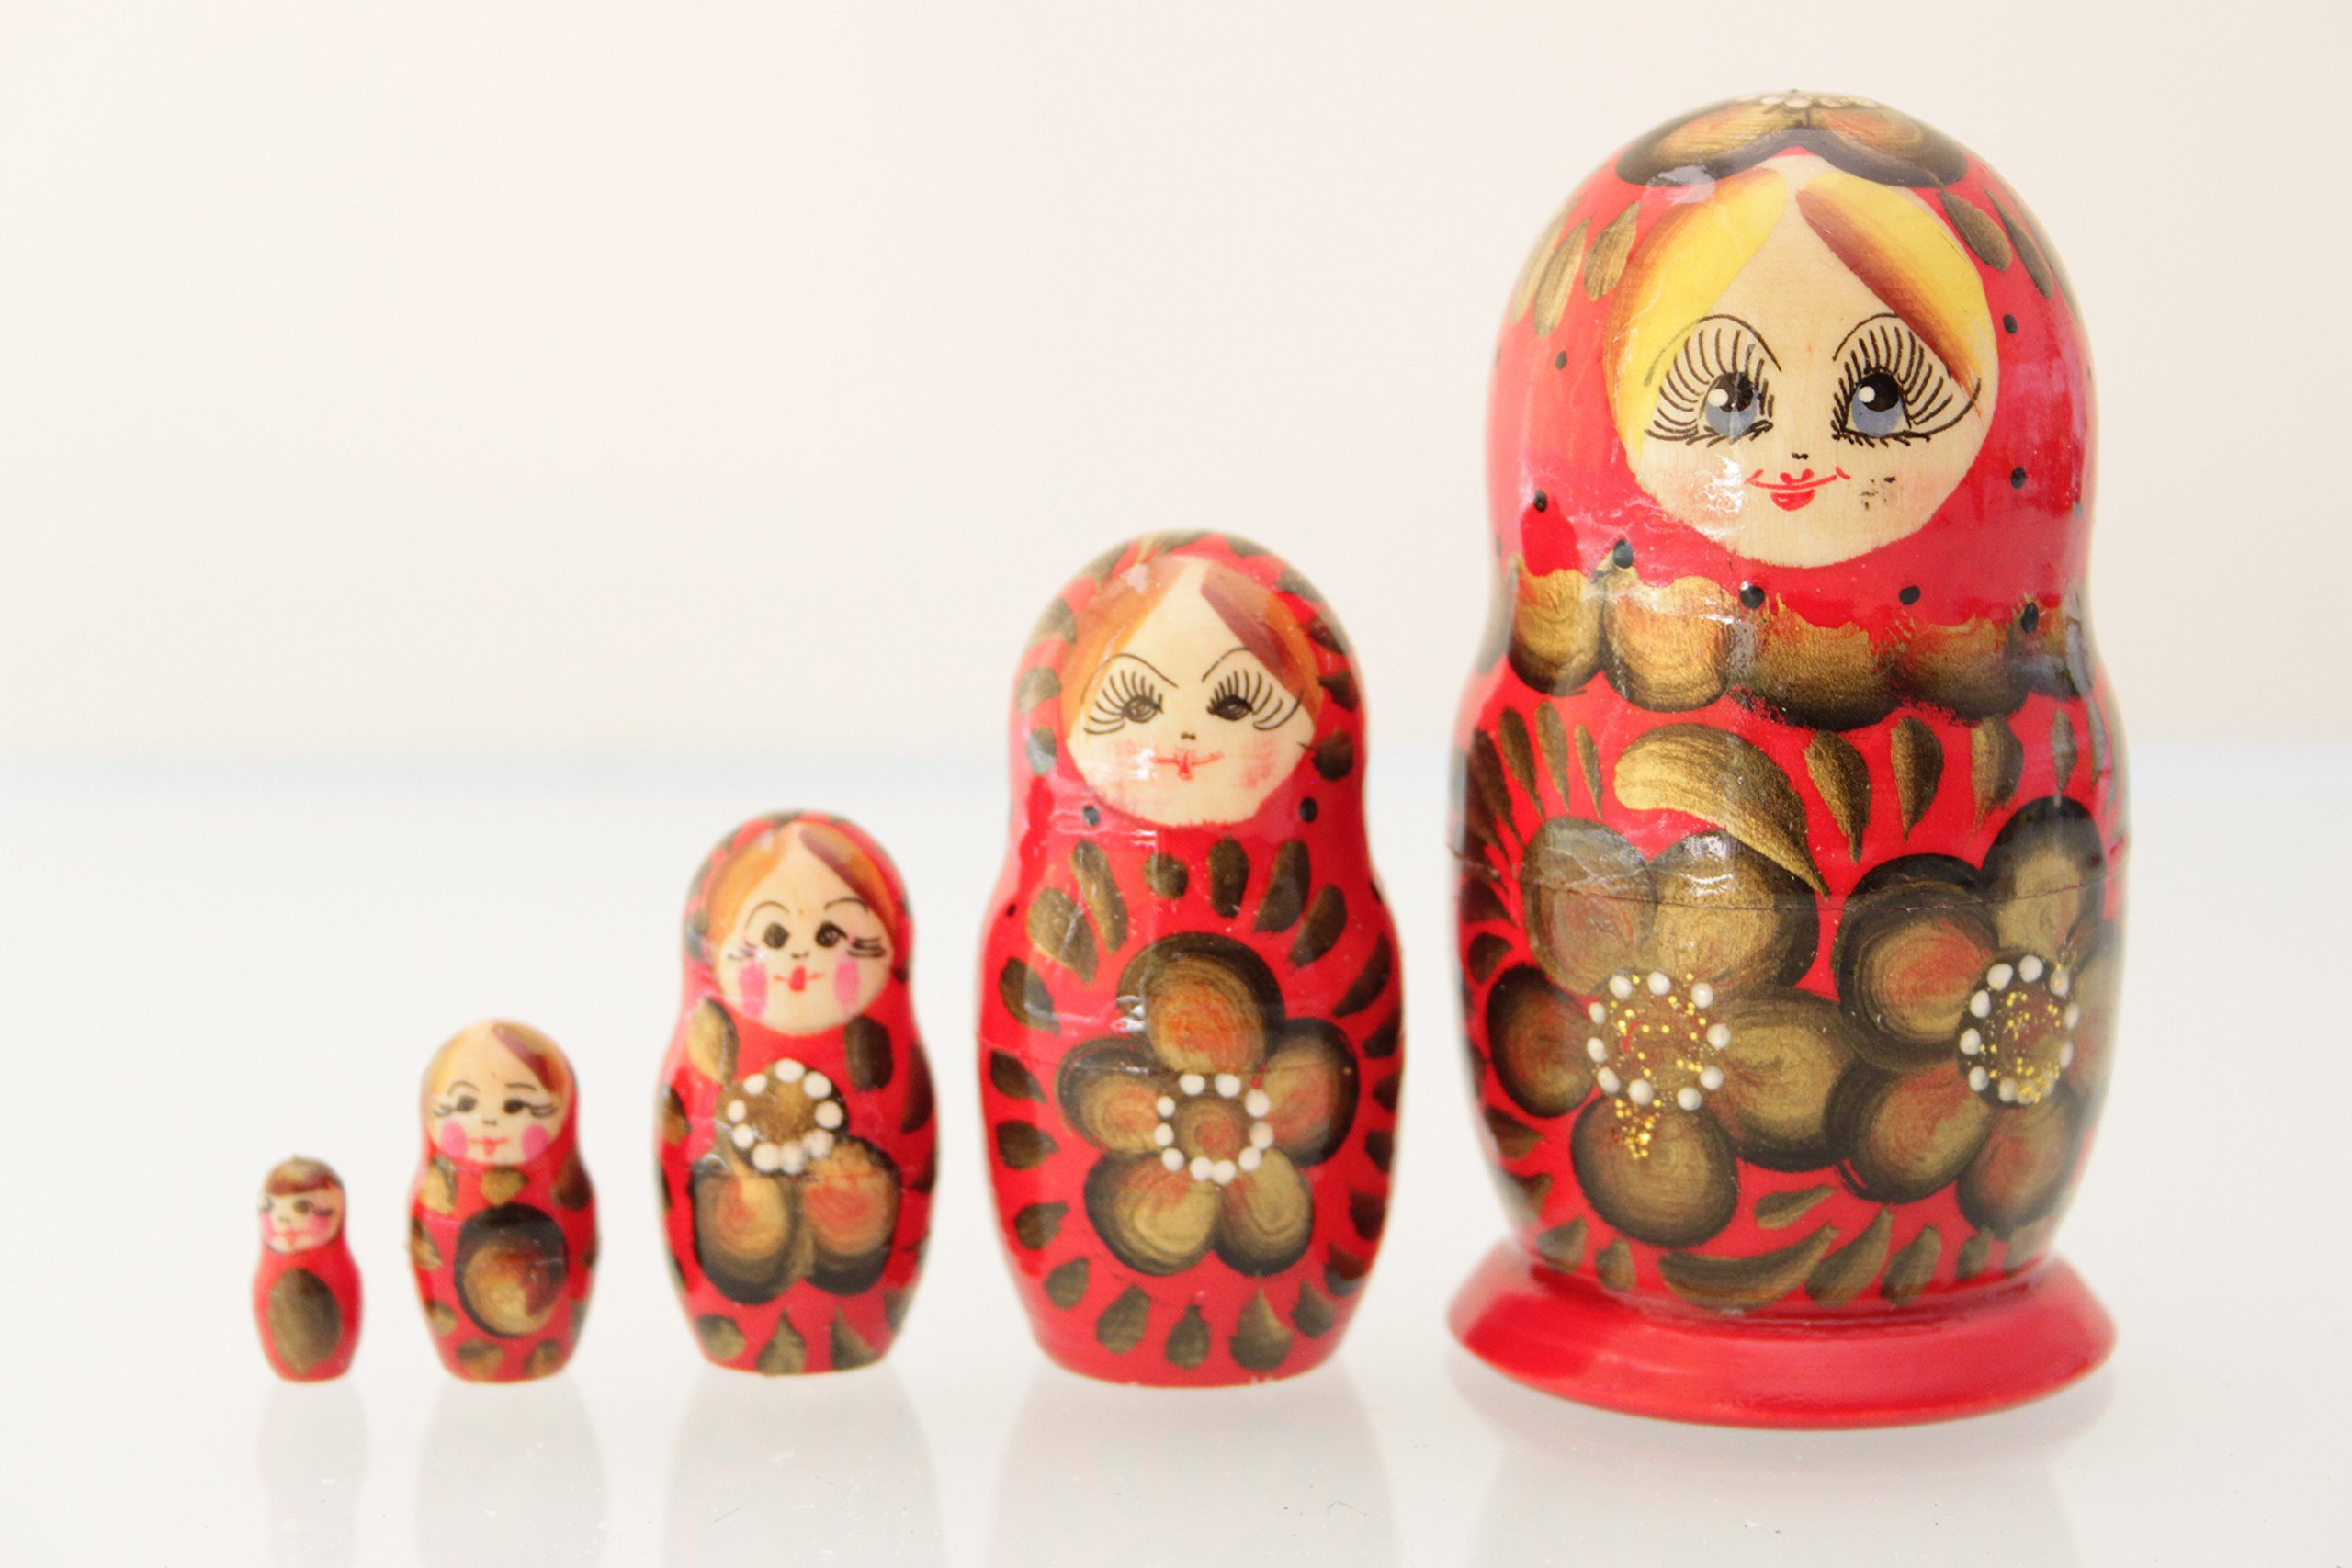 SODIAL R Russian Matryoshka Blank Nesting dolls paint your own set of 5 Russian Matryoshka